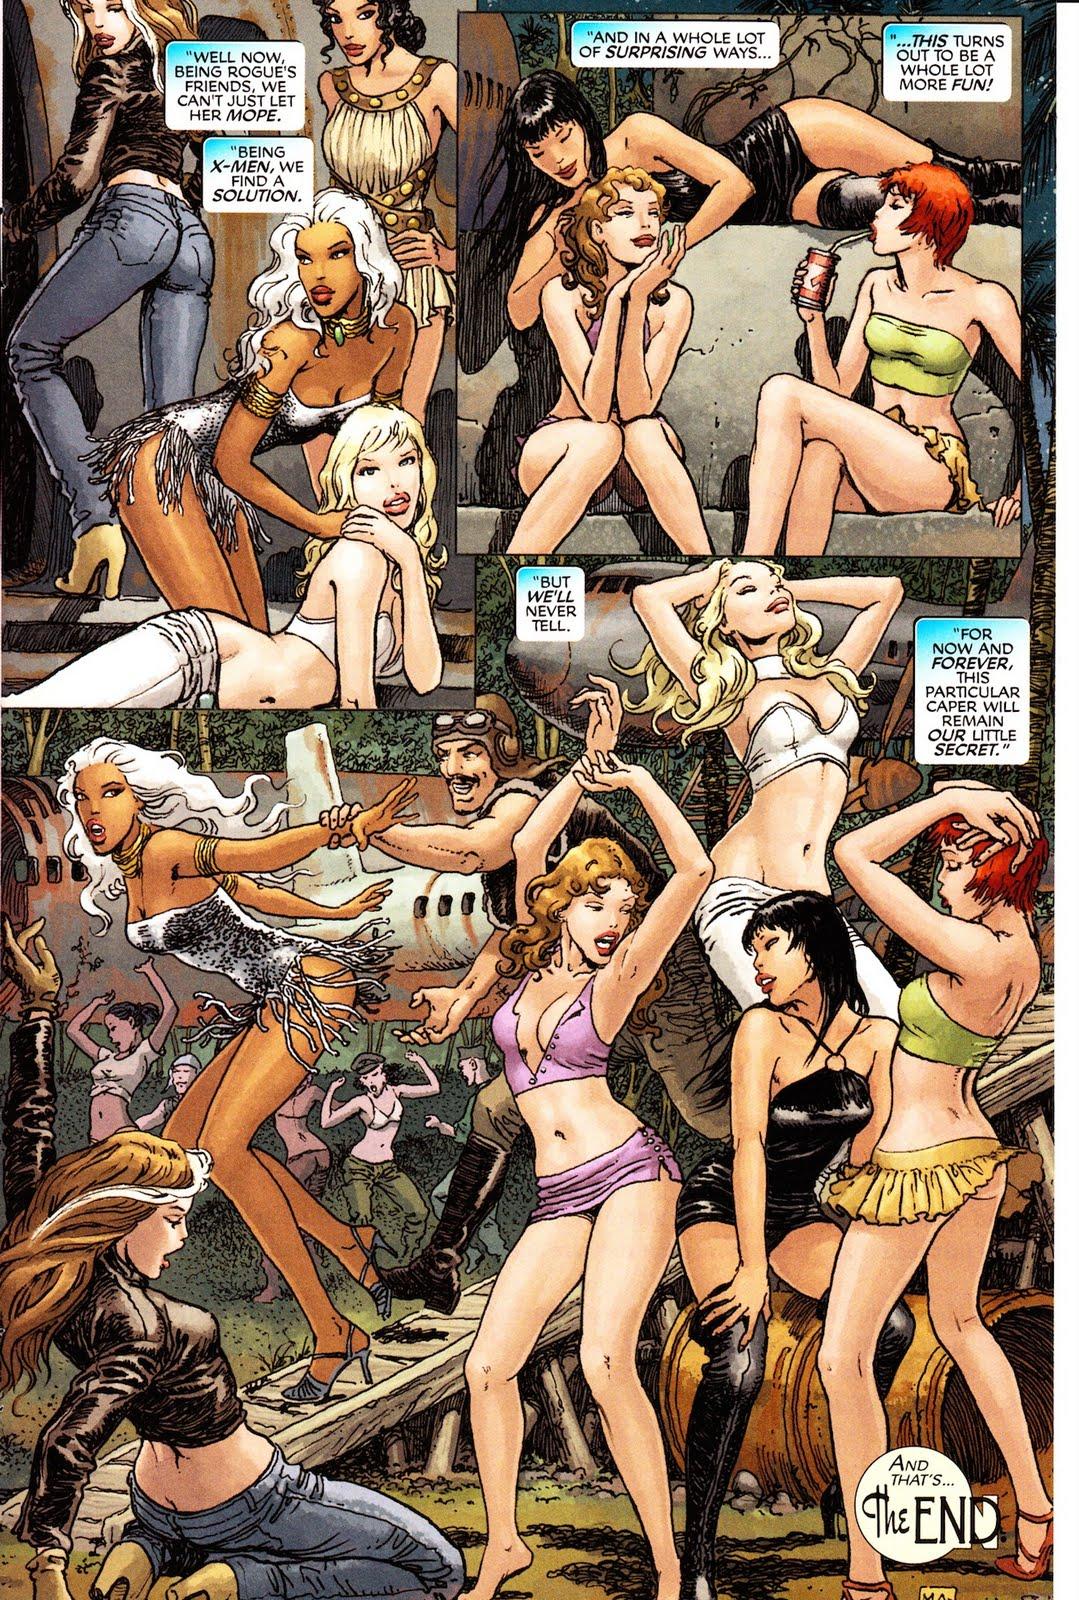 Comic marvel nude woman